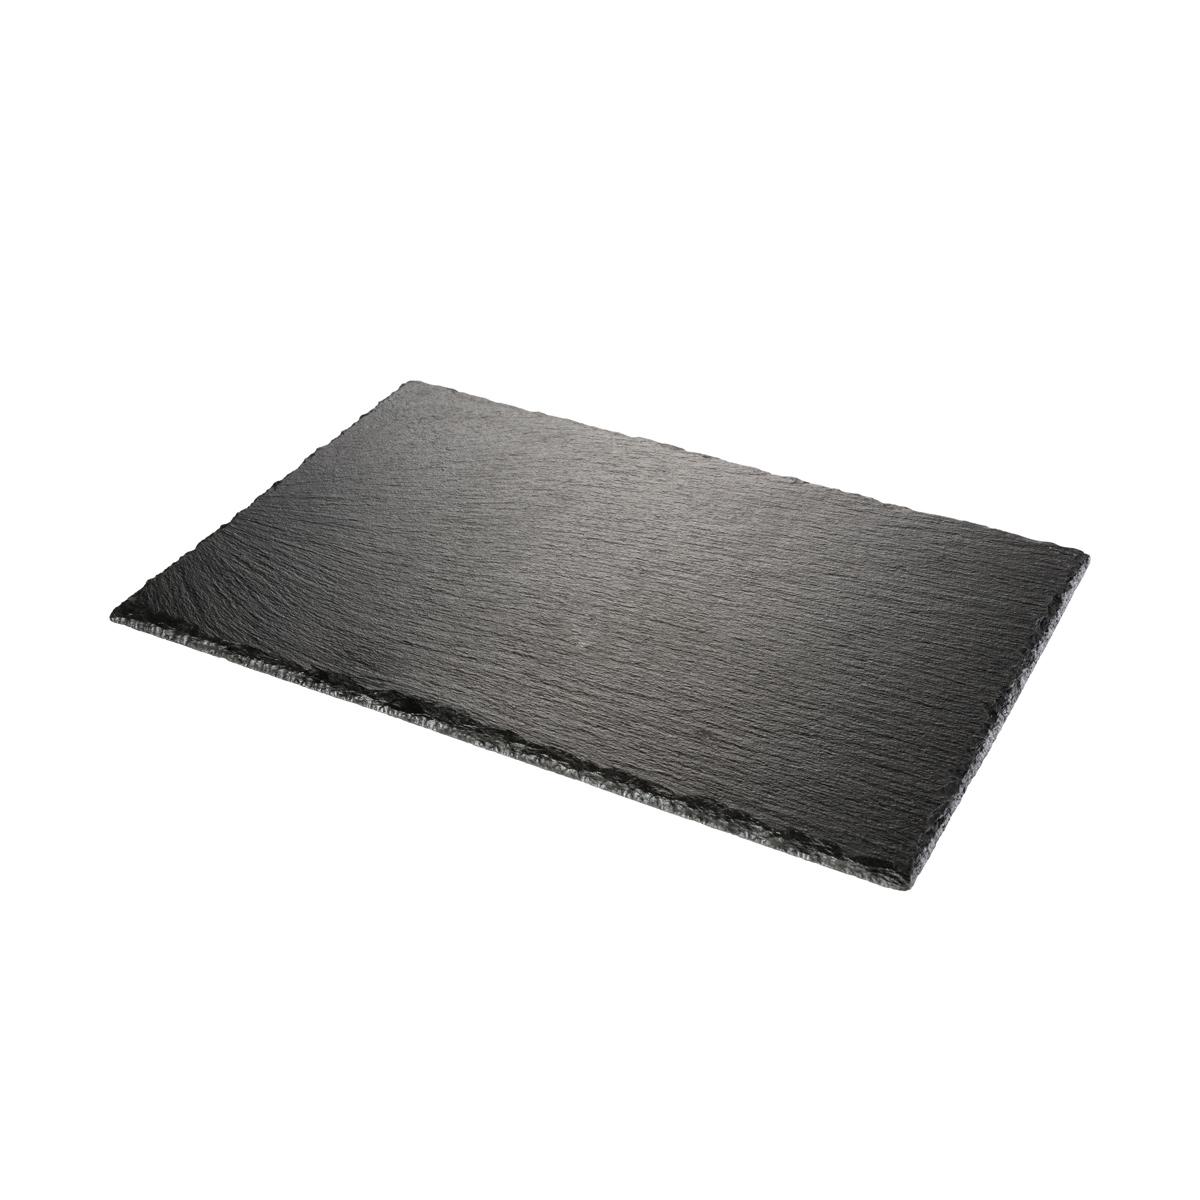 Servírovací deska GrandCHEF 35 x 25 cm